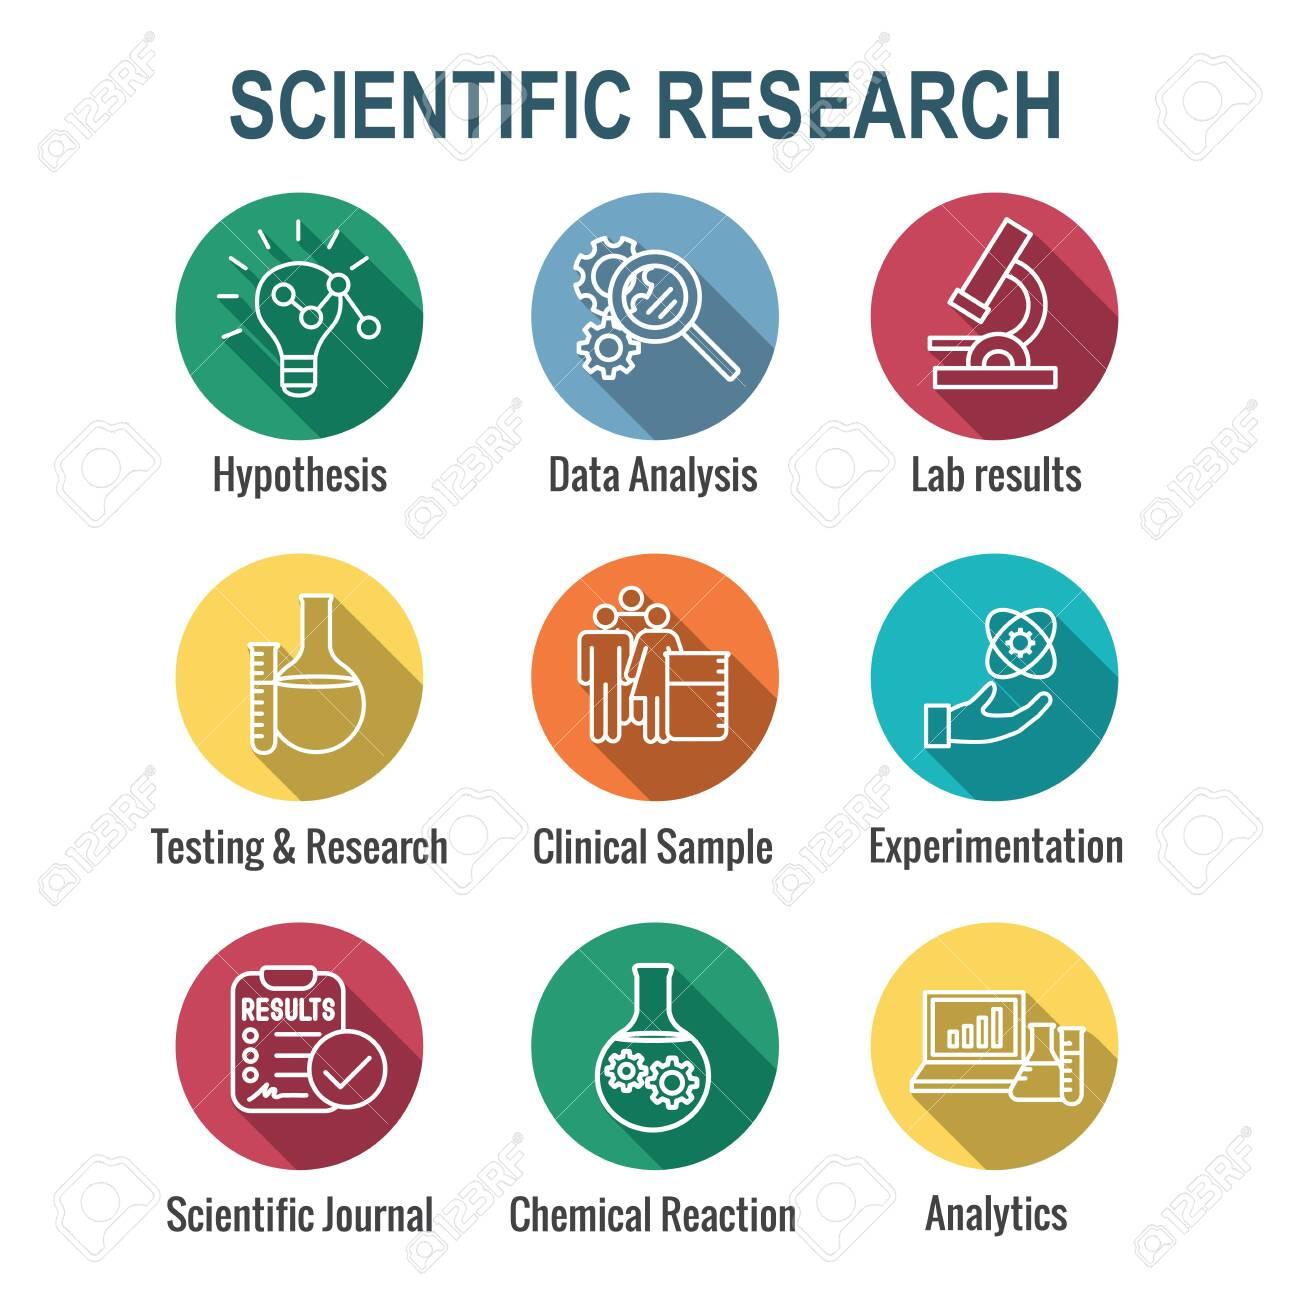 Scientific Process Icon Set - hypothesis, analysis, etc - 134220346